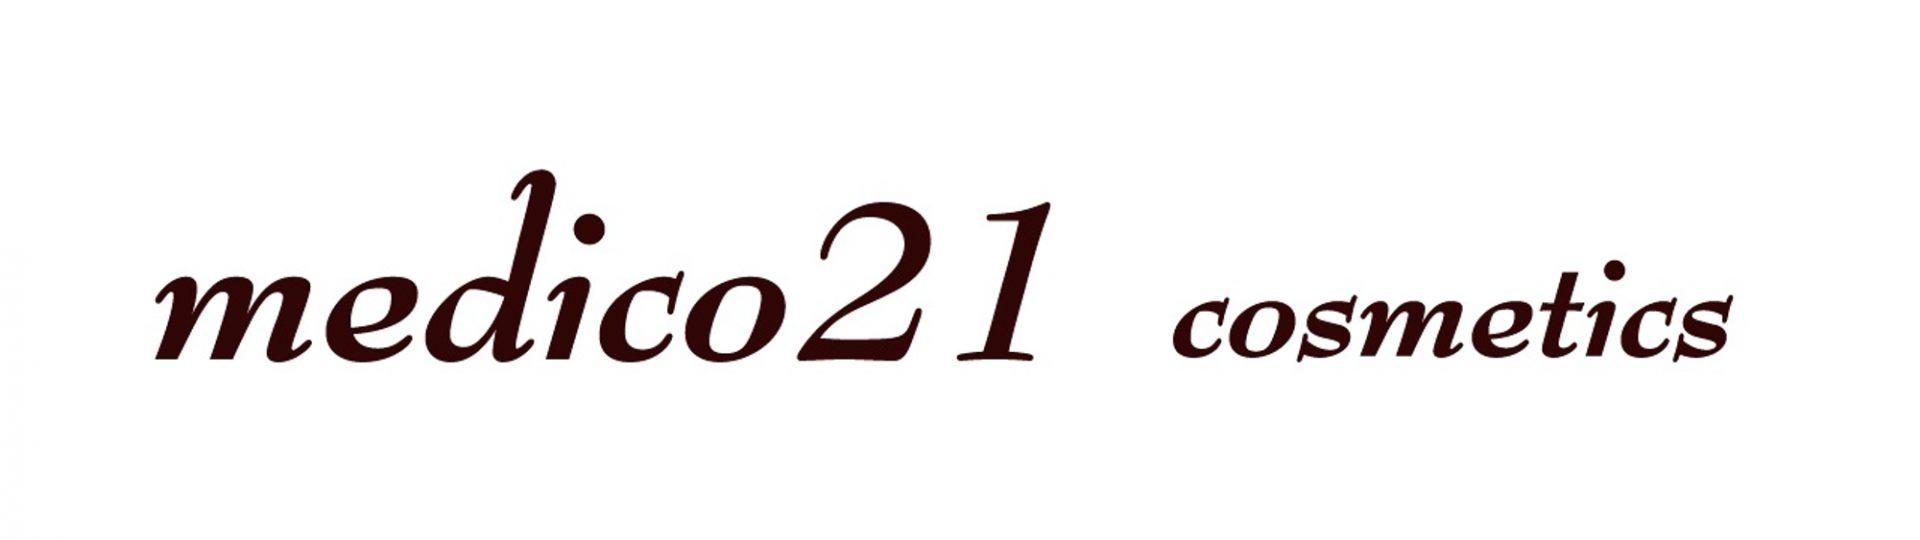 彩妝專門店「medico21 cosmetics」